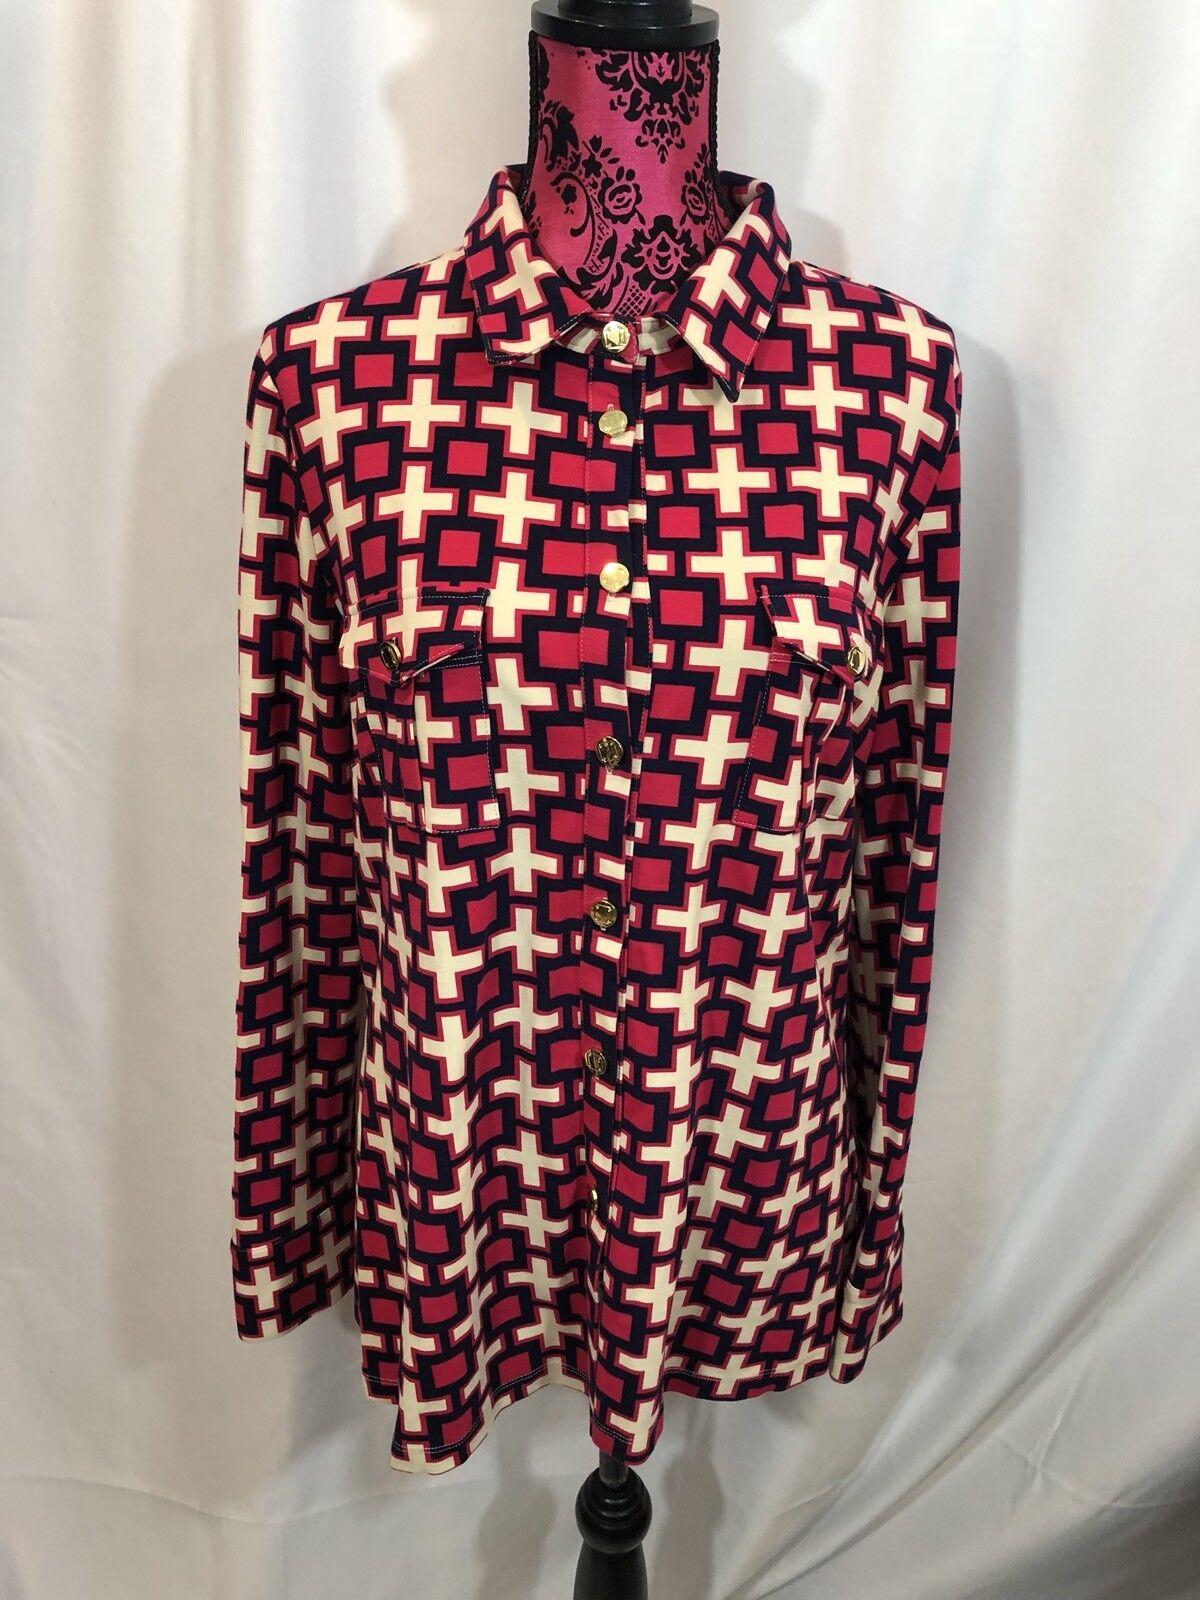 NWT Elizabeth McKay Pink Dark bluee White Cross Long Sleeve Top Size XL